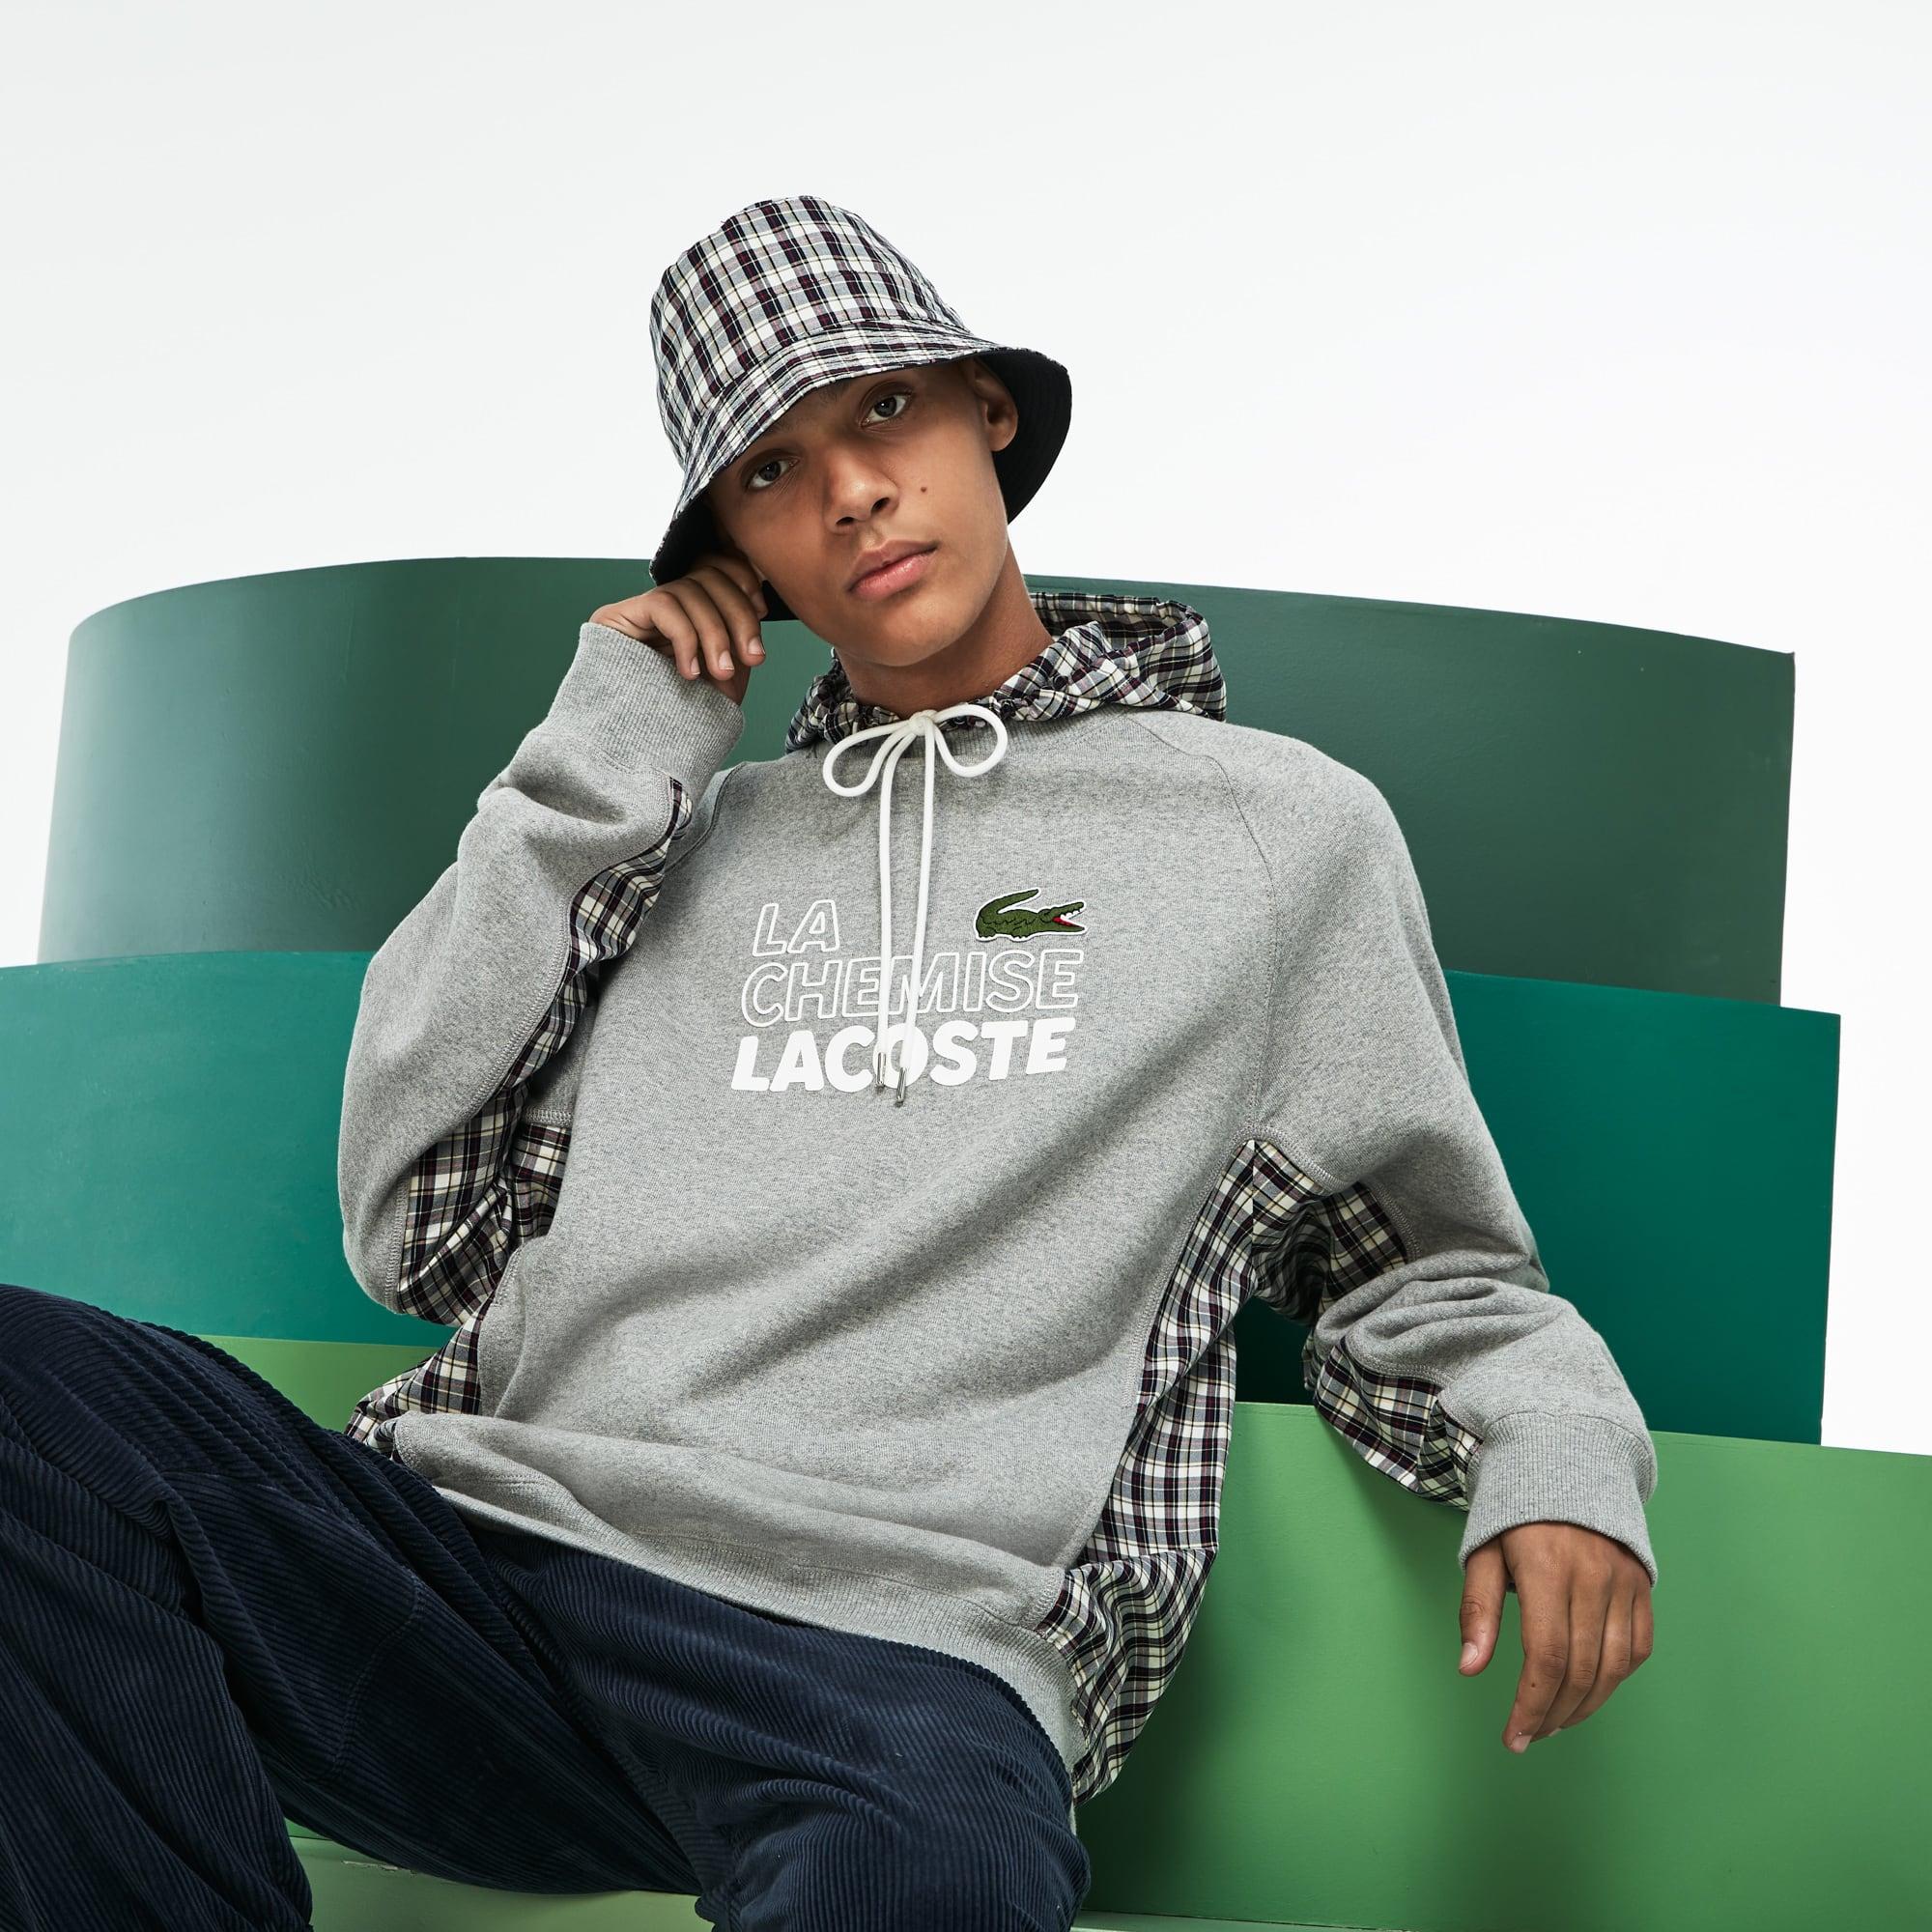 Men's Fashion Show 2-in-1 Fleece And Check Poplin Sweatshirt